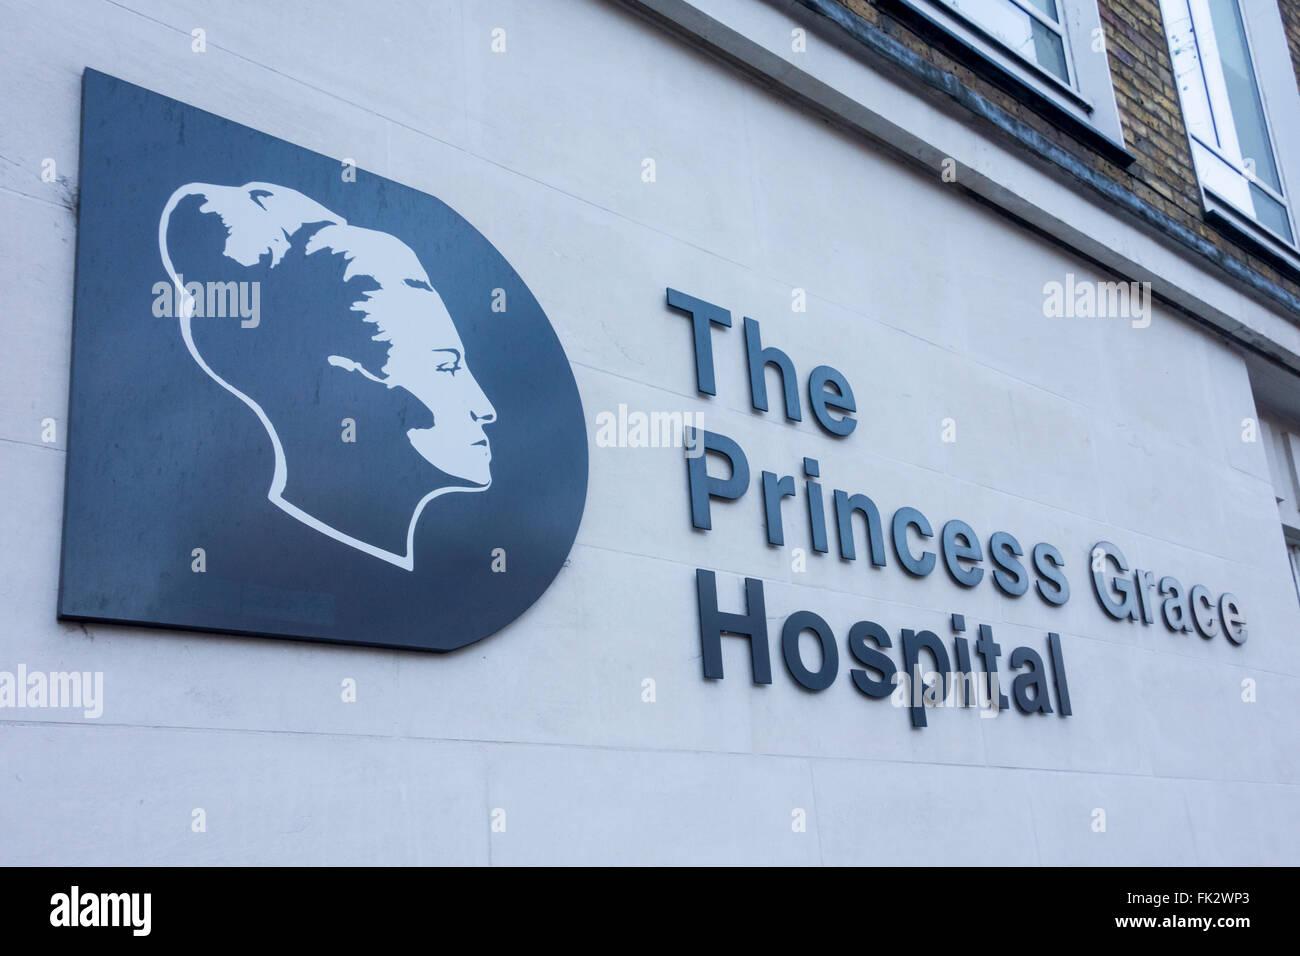 Le Centre Hospitalier Princesse Grace, Marylebone Road, Londres, UK Photo Stock